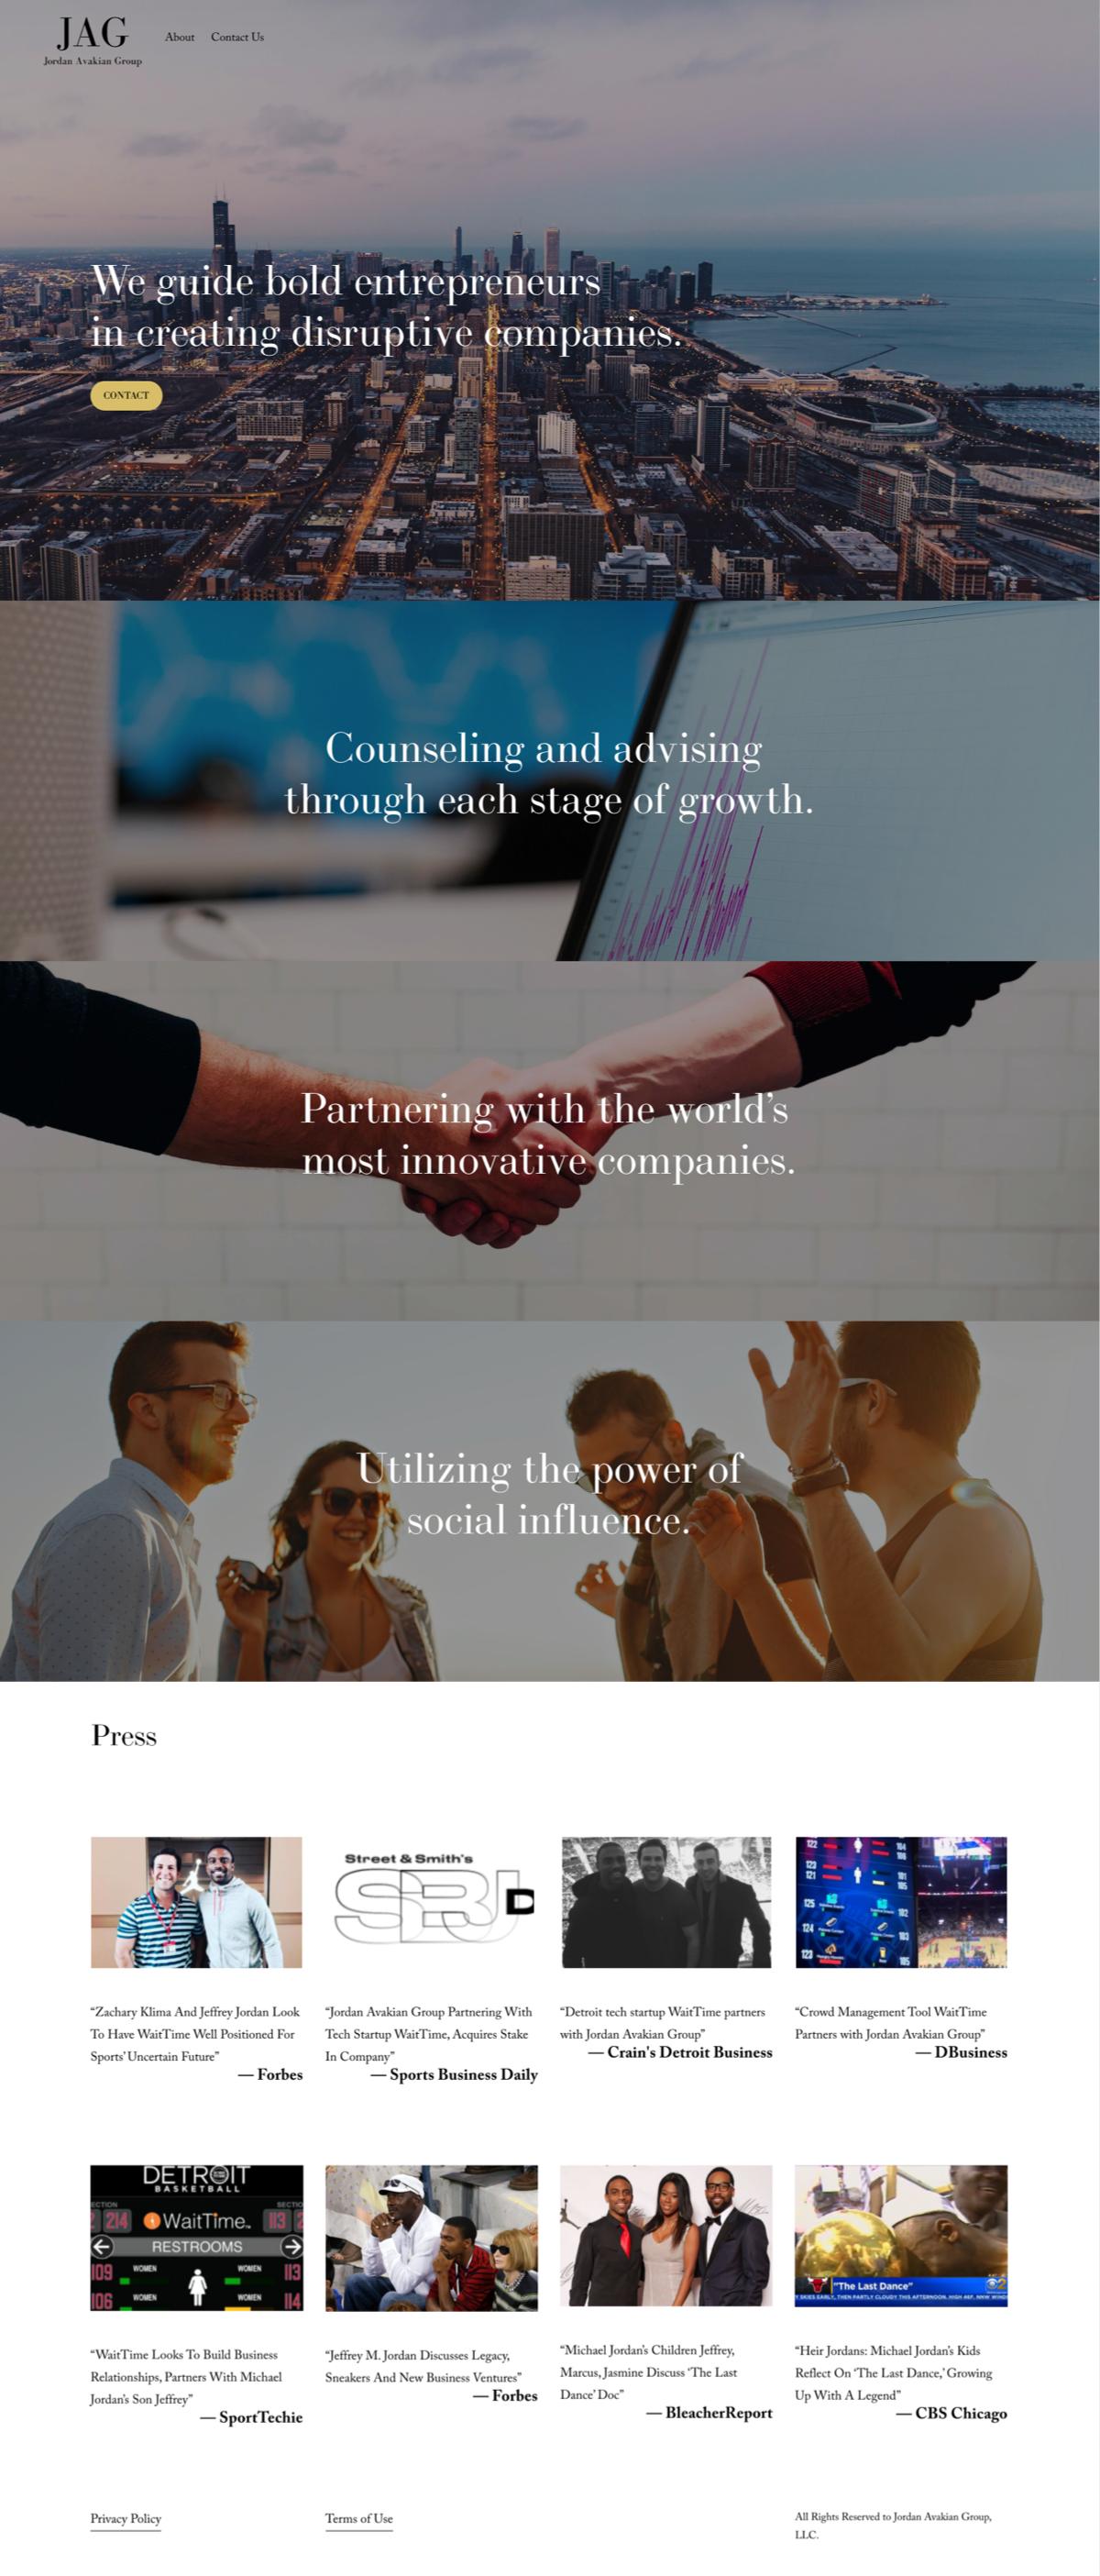 Voosh built a website for Jeffrey Jordan and Savan Avakian. JAG, Jordan Avakian Group. This is a mock of the website.